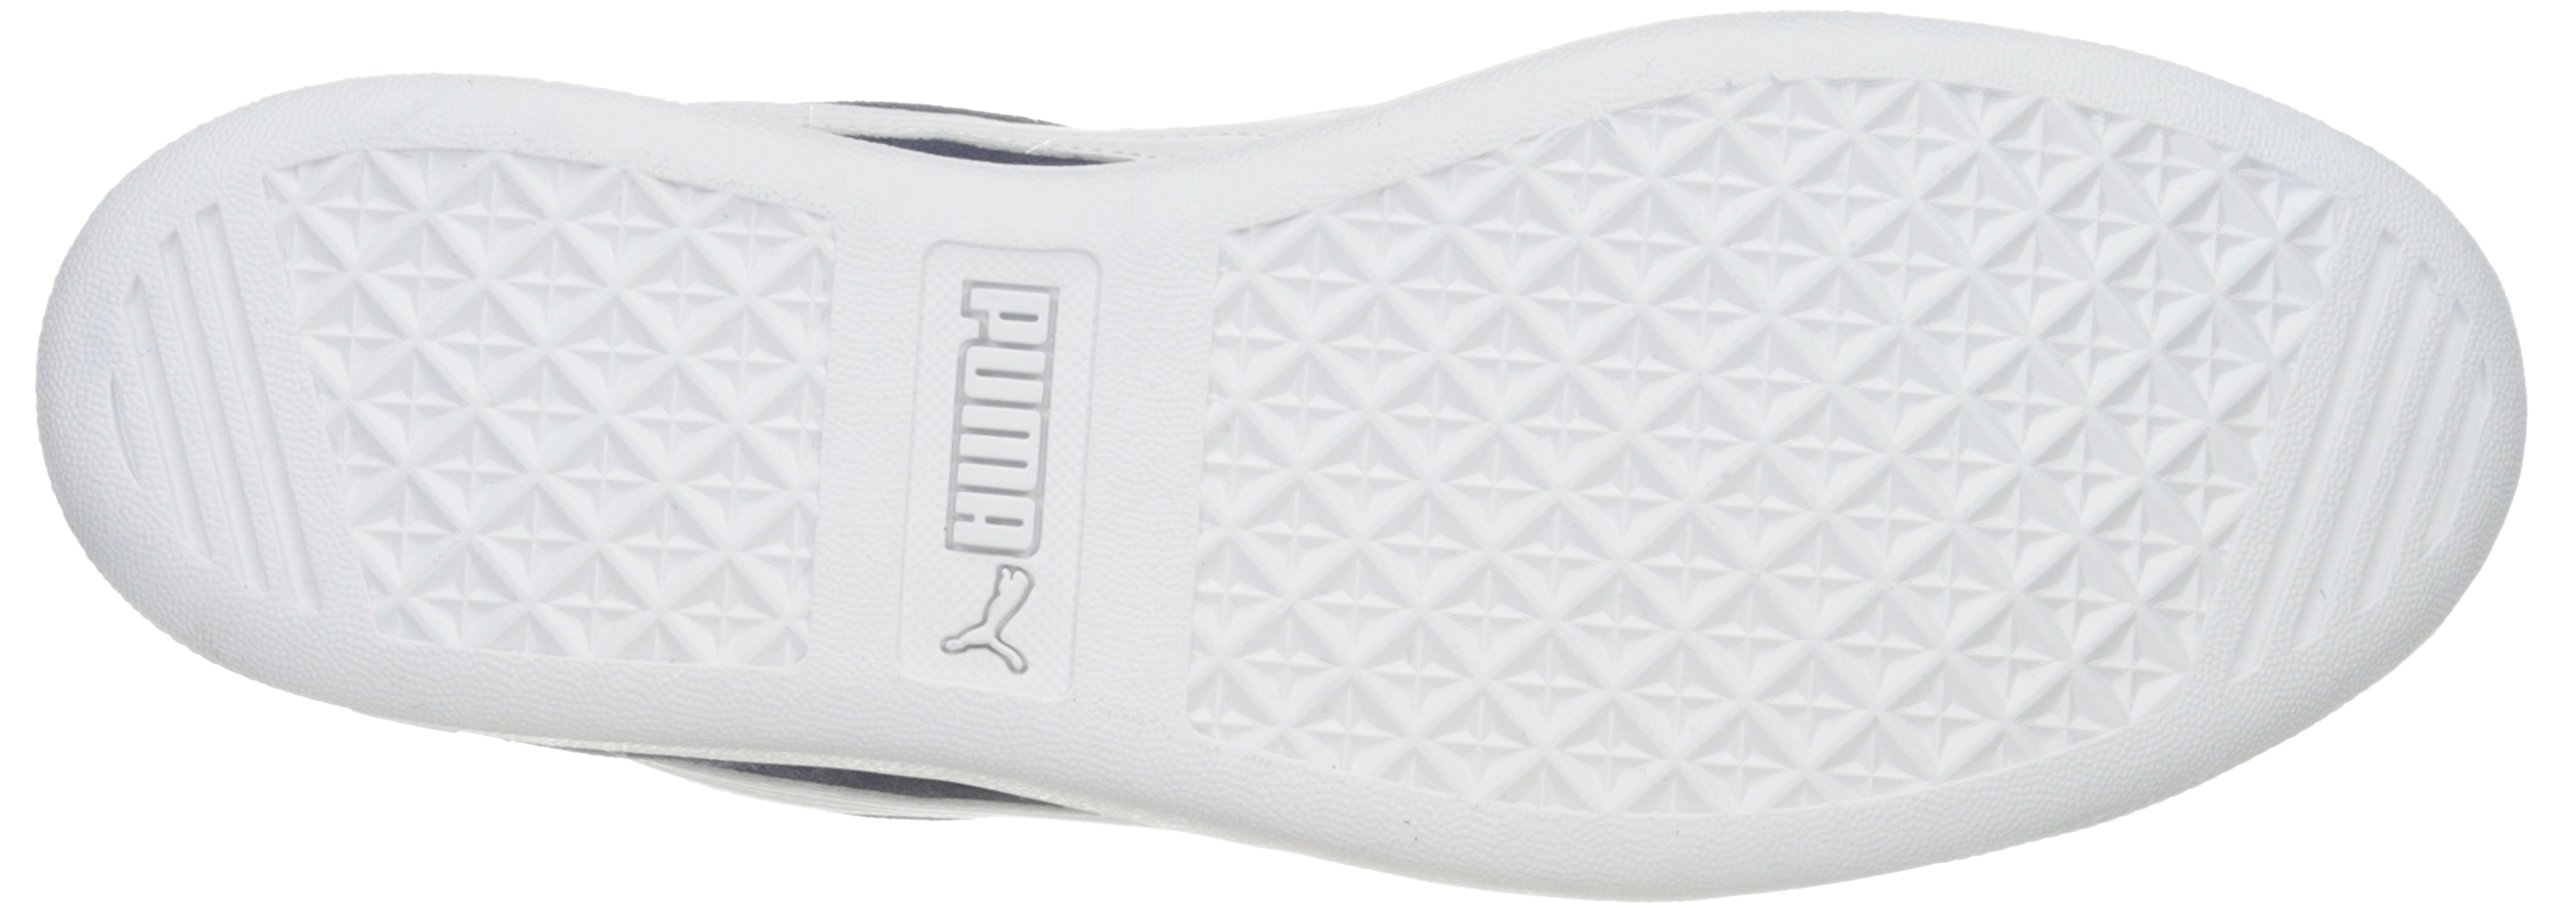 PUMA Women's Vikky Sfoam Fashion Sneaker, Peacoat White, 10 M US by PUMA (Image #3)